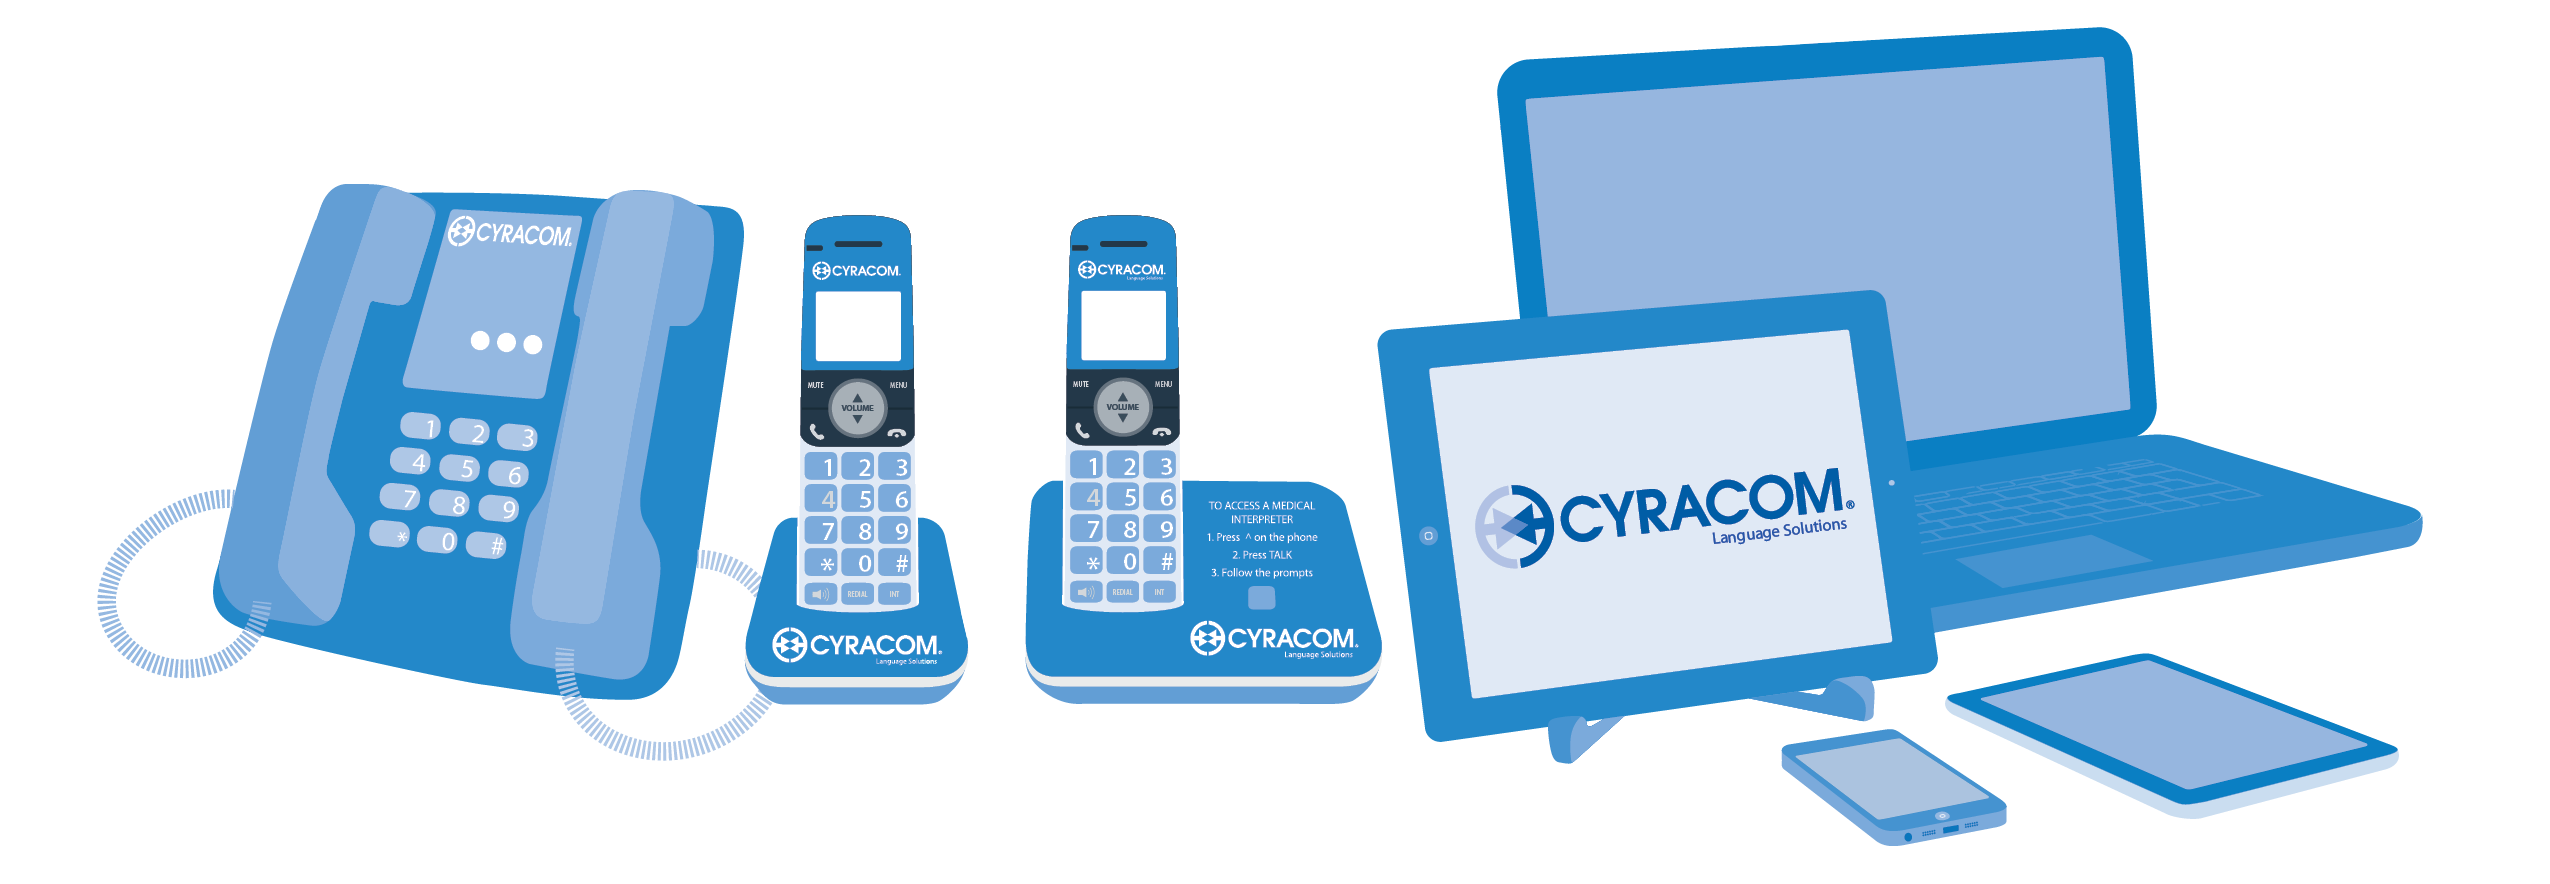 CyraCom-devices